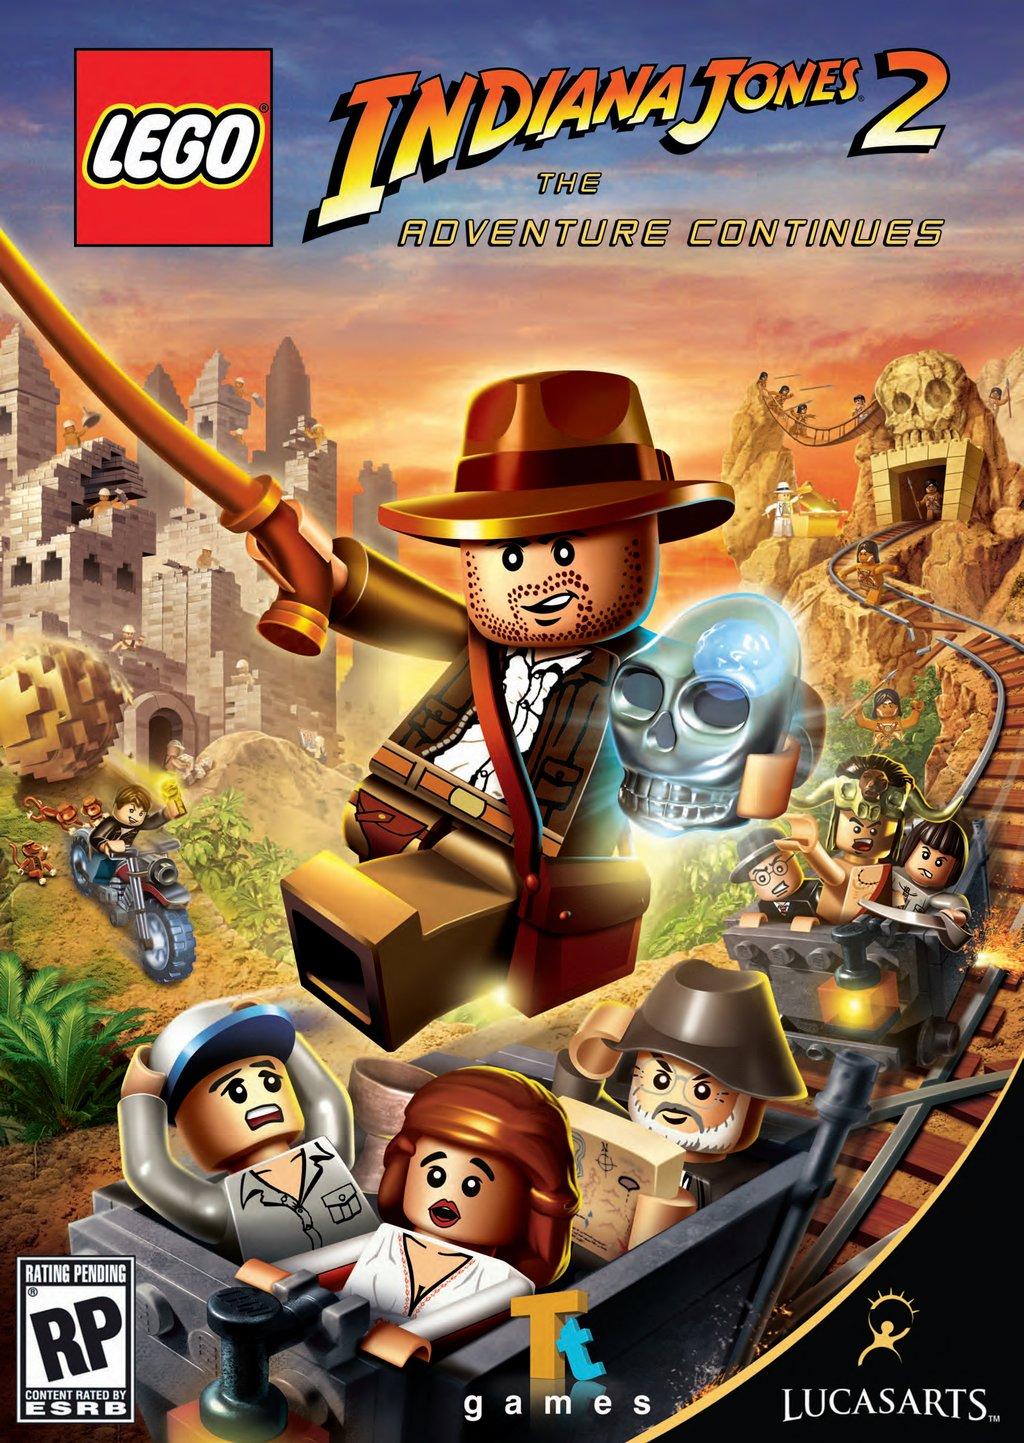 Distraction: Lego Indiana Jones 2: The Adventure Continues